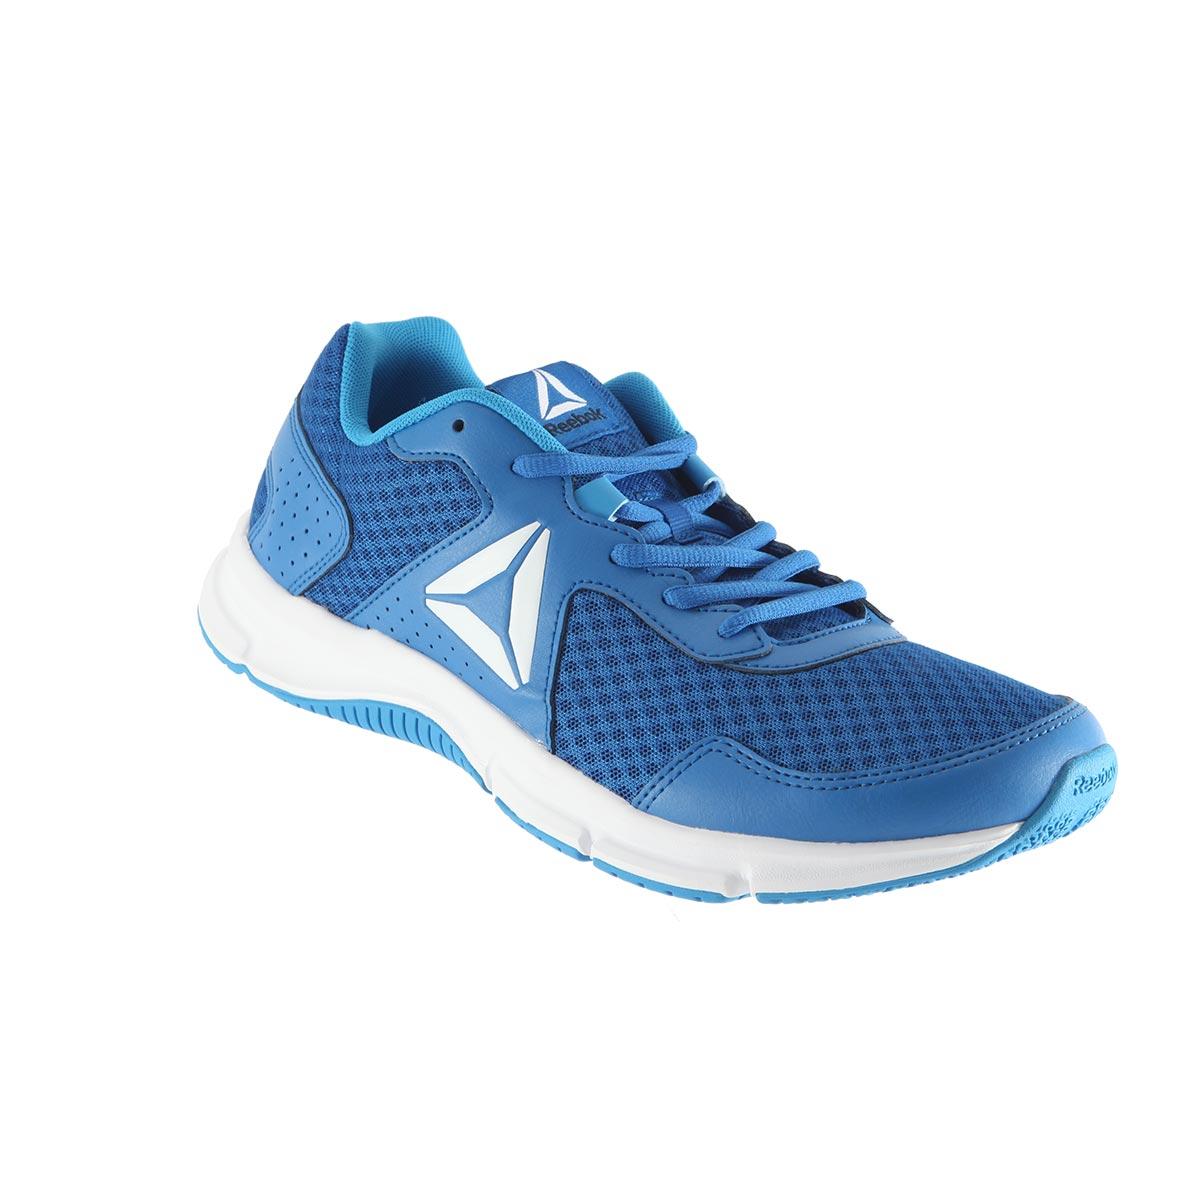 Tênis Reebok Canton Runner BD5779